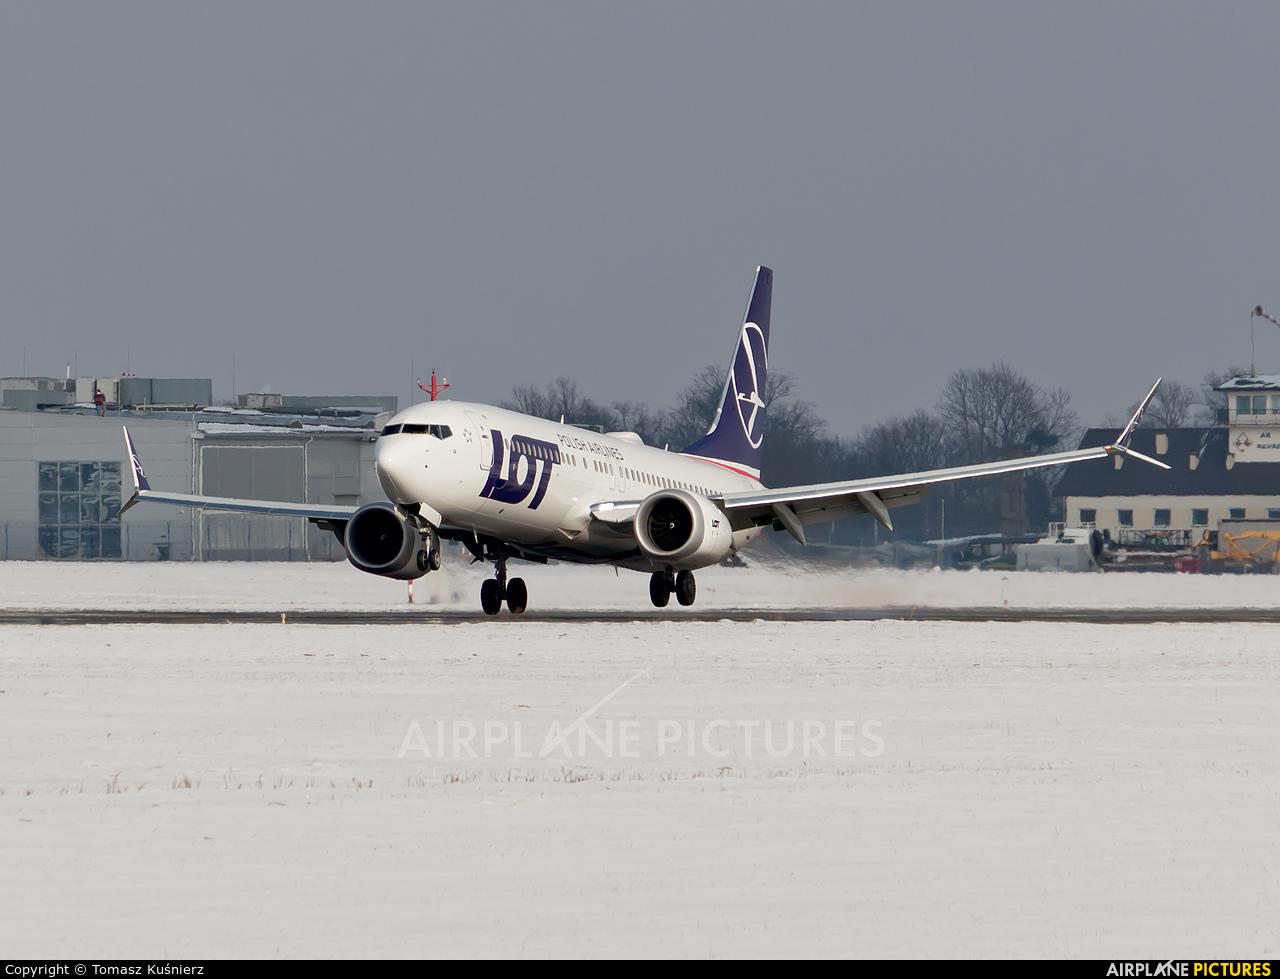 LOT - Polish Airlines SP-LVA aircraft at Rzeszów-Jasionka